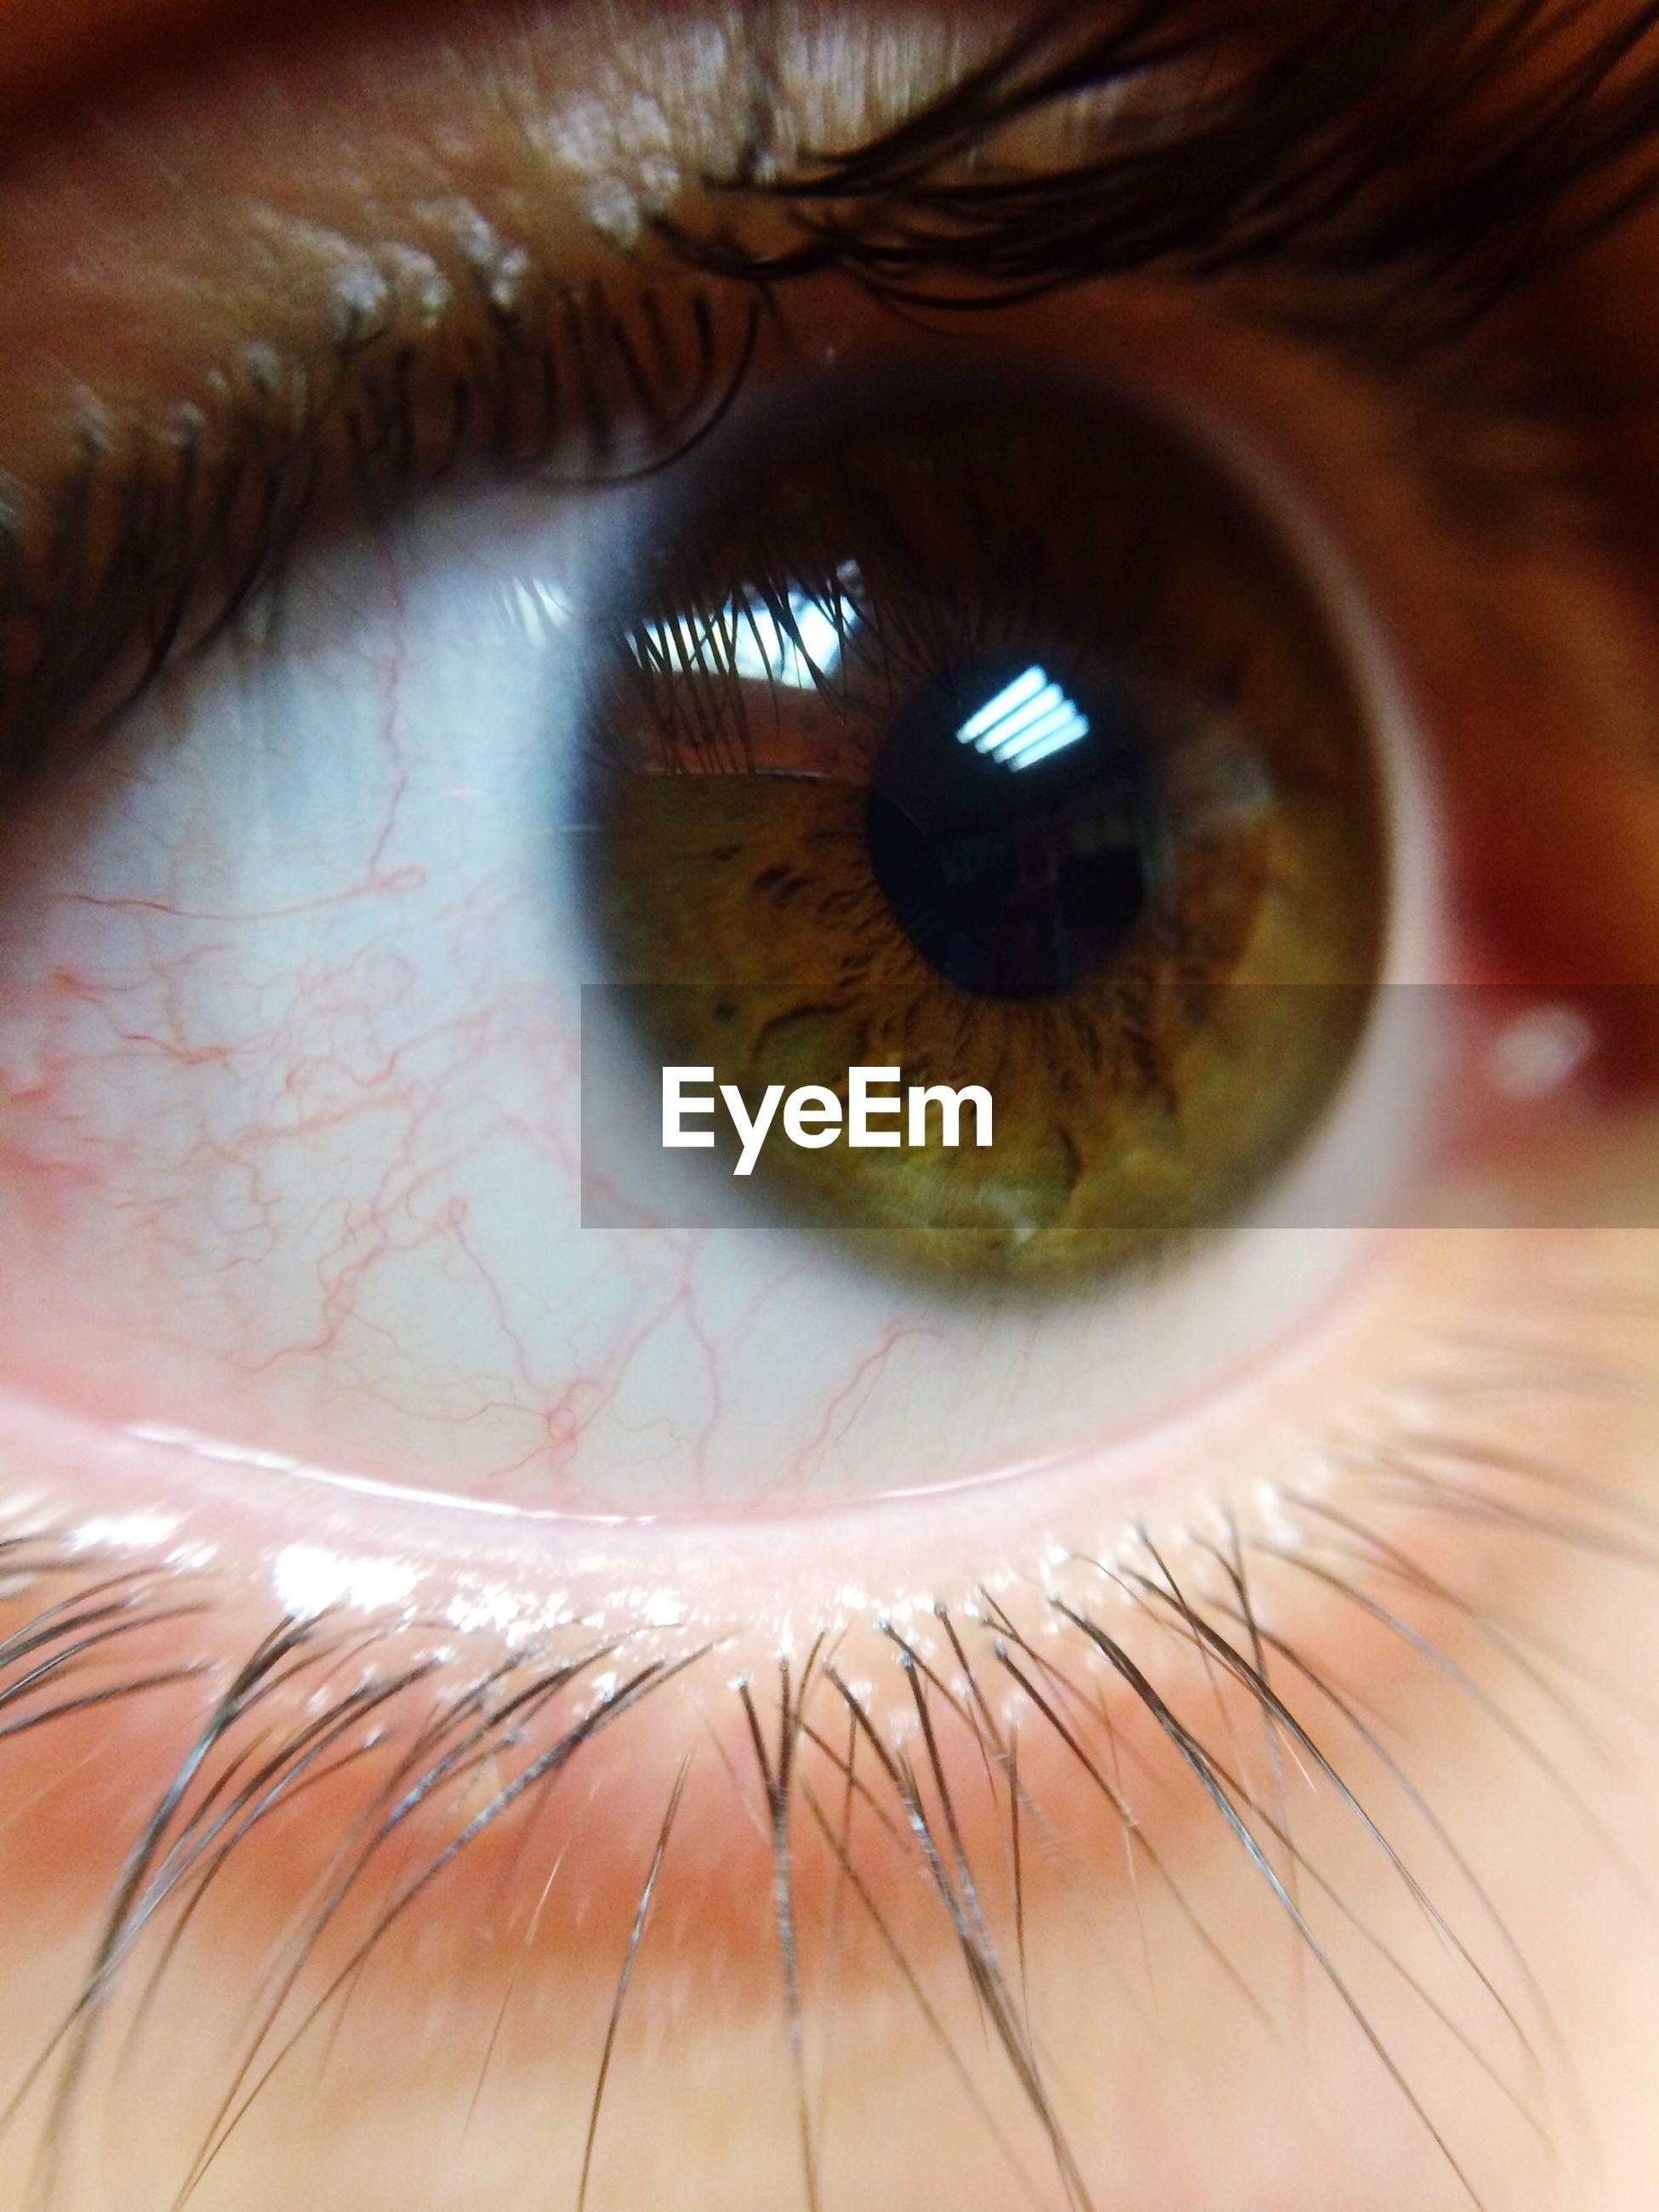 human eye, eyelash, eyesight, close-up, indoors, sensory perception, extreme close-up, full frame, part of, iris - eye, eyeball, human skin, backgrounds, vision, looking at camera, detail, extreme close up